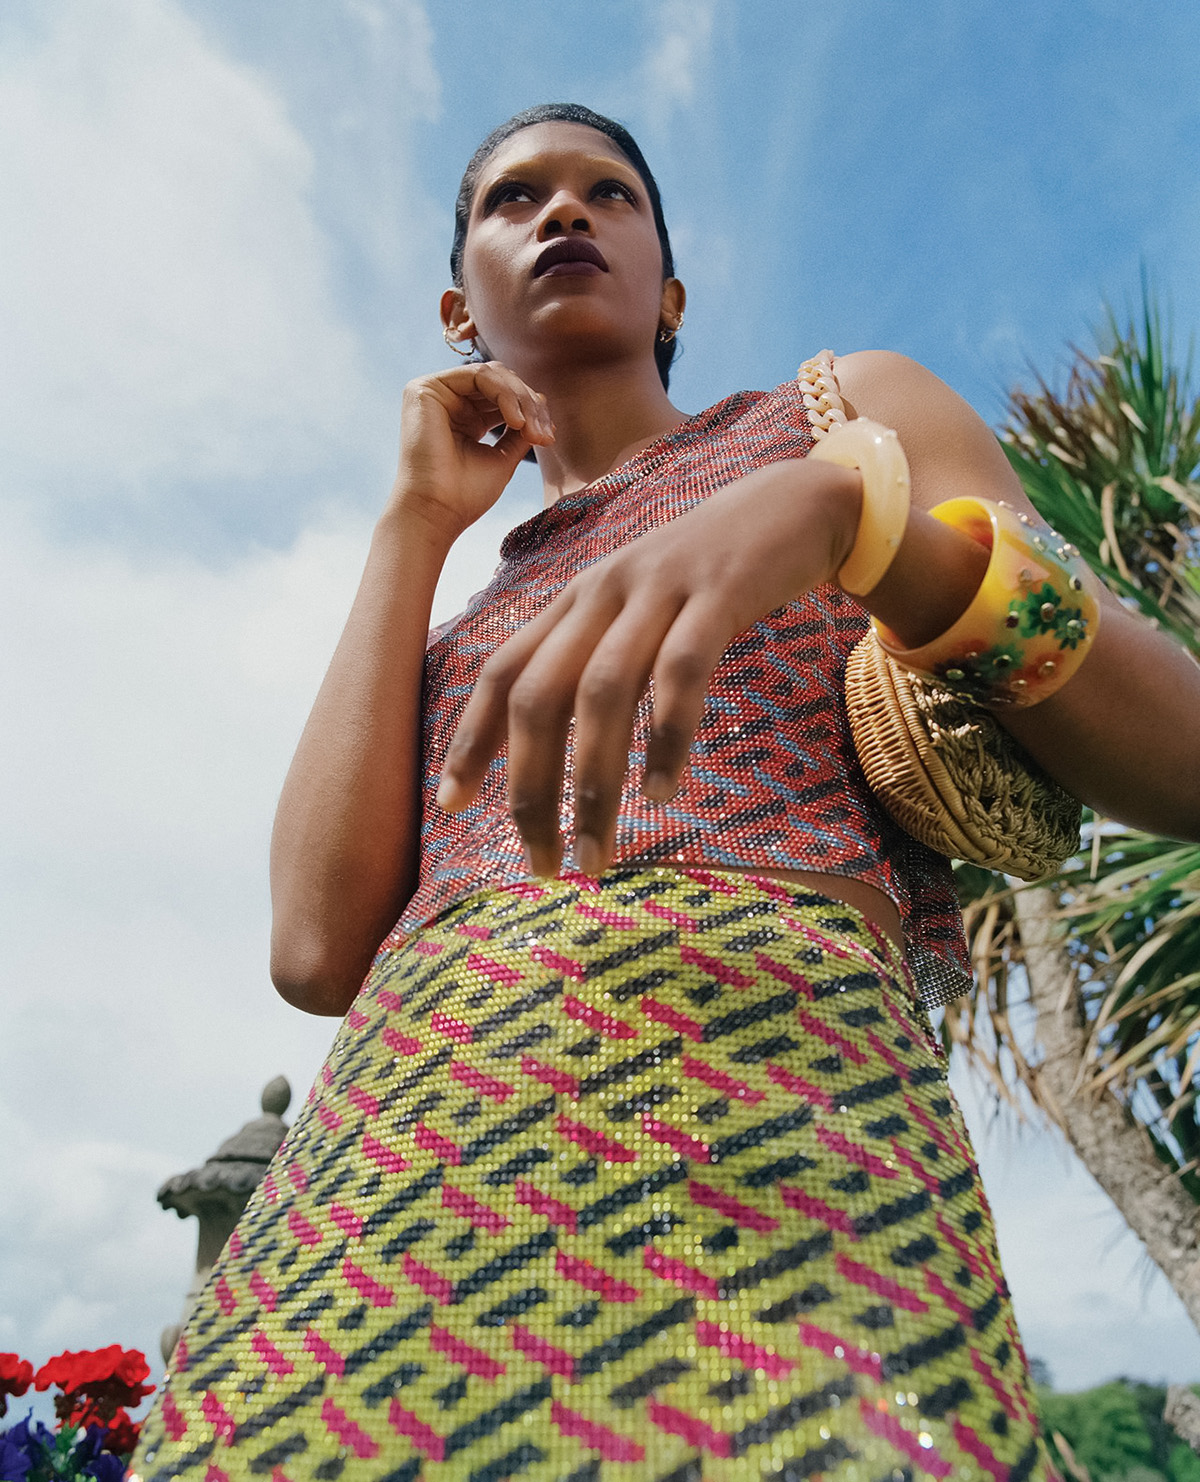 Shivaruby Premkanthan by Nadine Ijewere for WSJ. Magazine Fall 2021